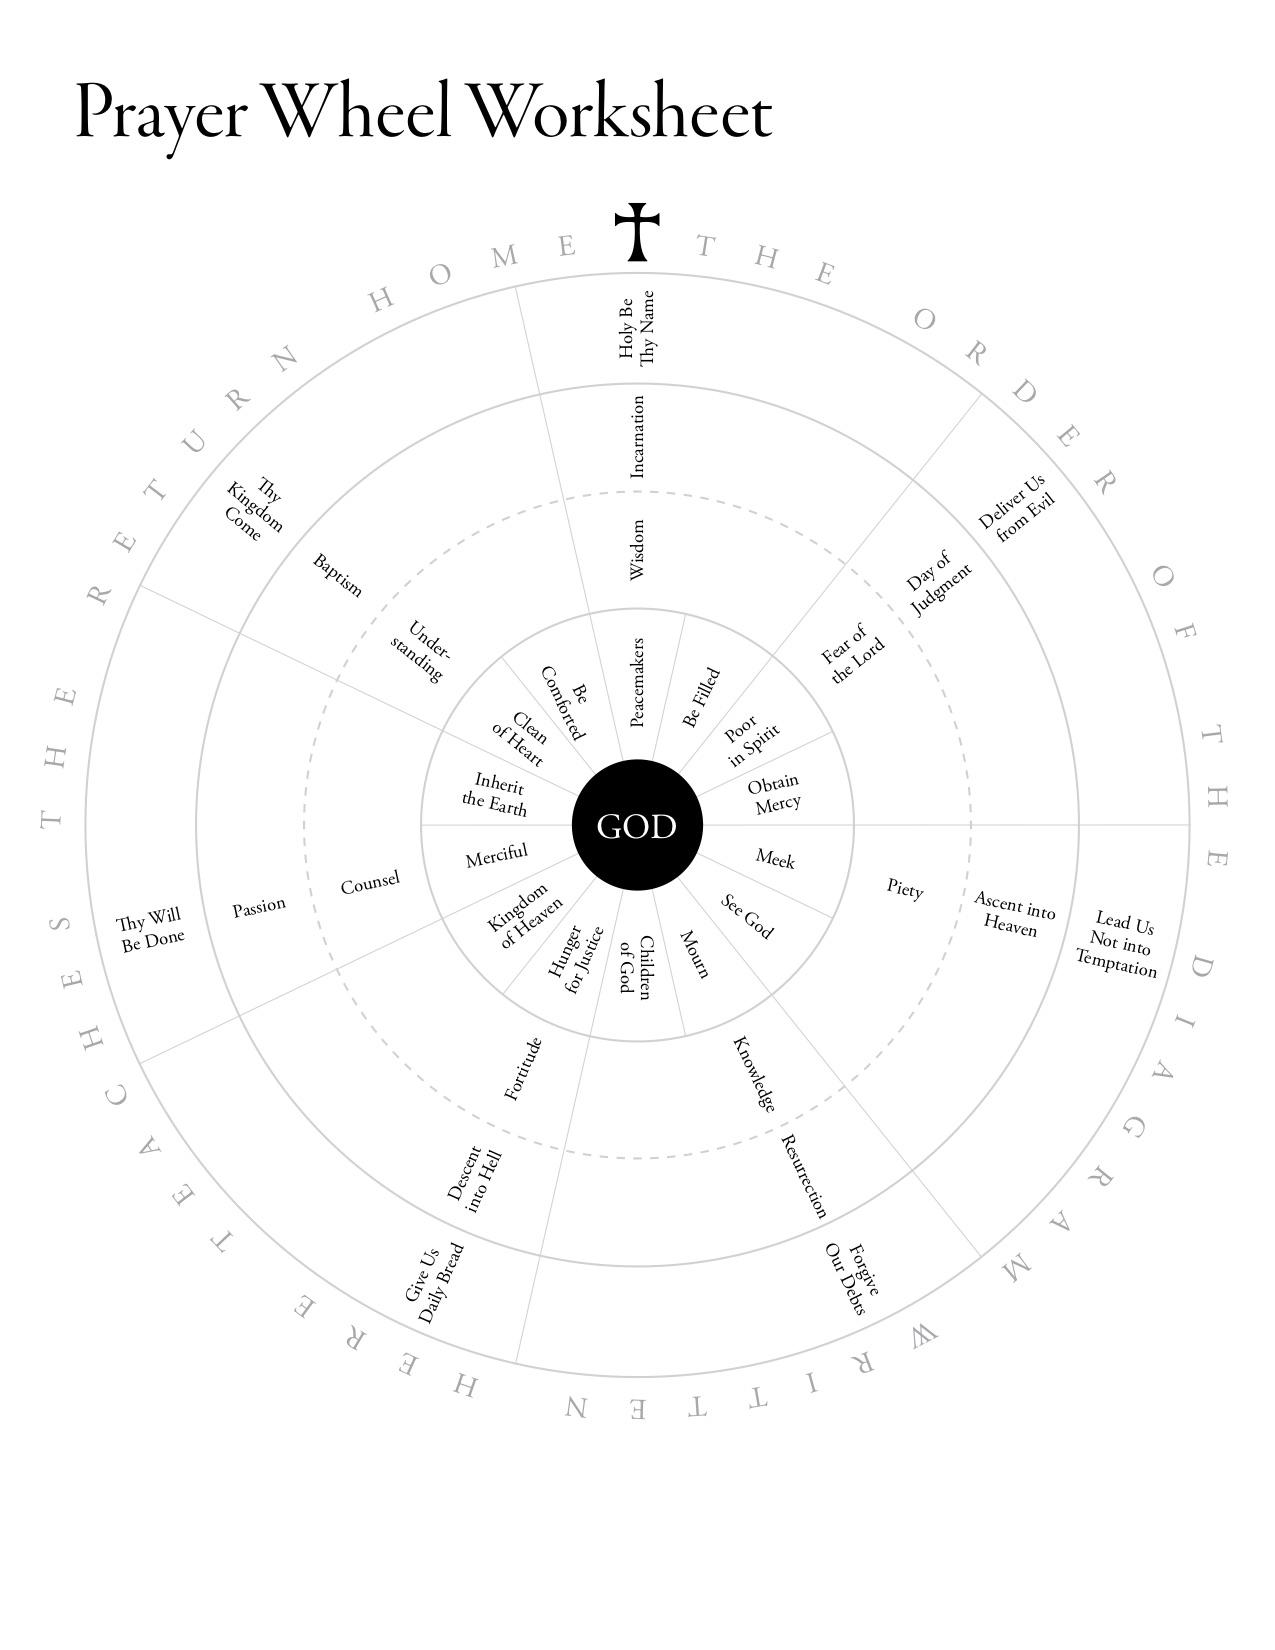 483 The Prayer Wheel An Early Christian Handheld Device